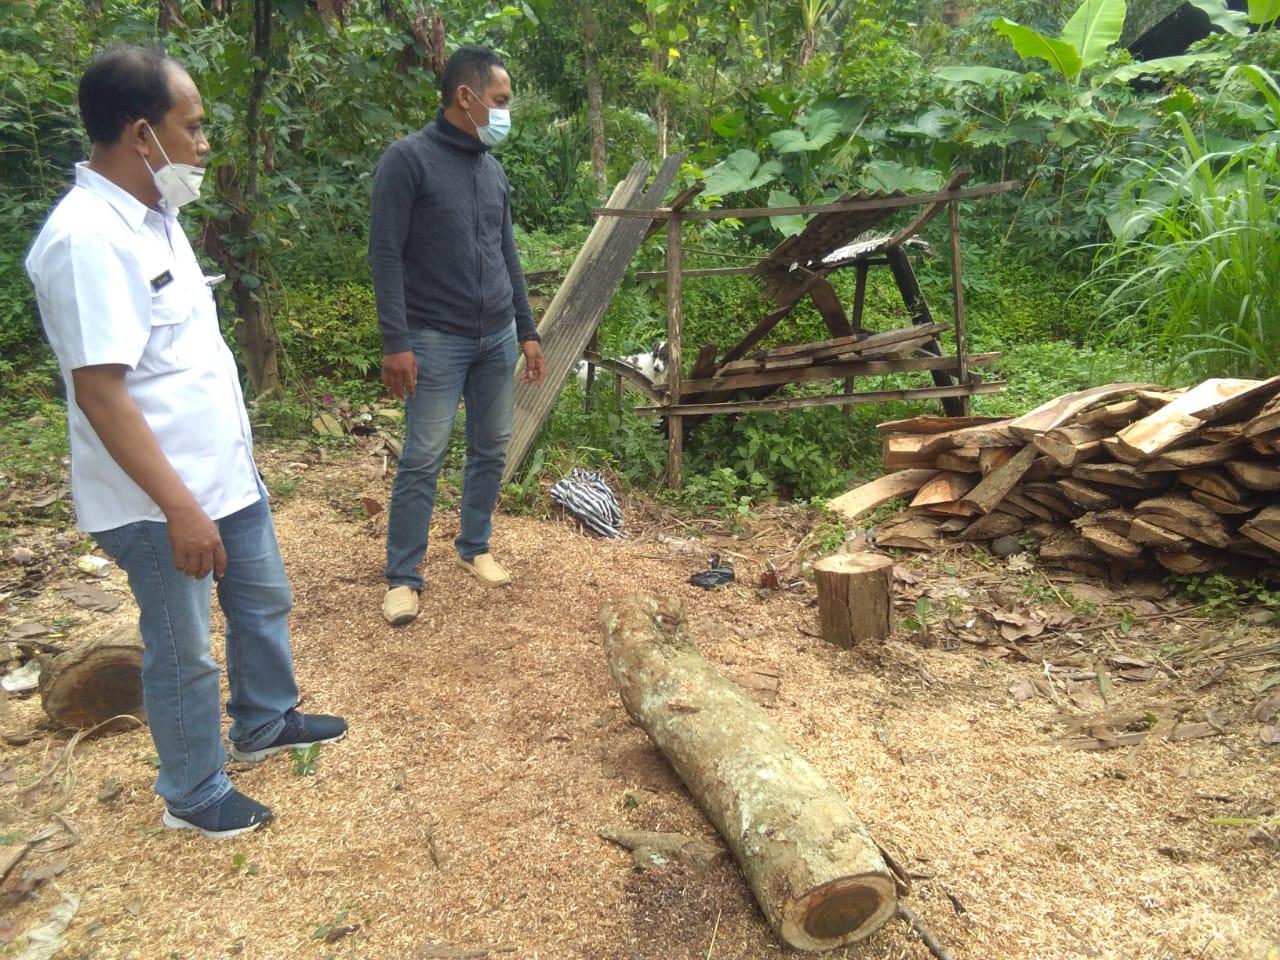 Petugas perlihatkan beberapa potong kayu gelondongan yang telah ditebang para pelaku ilegal loging